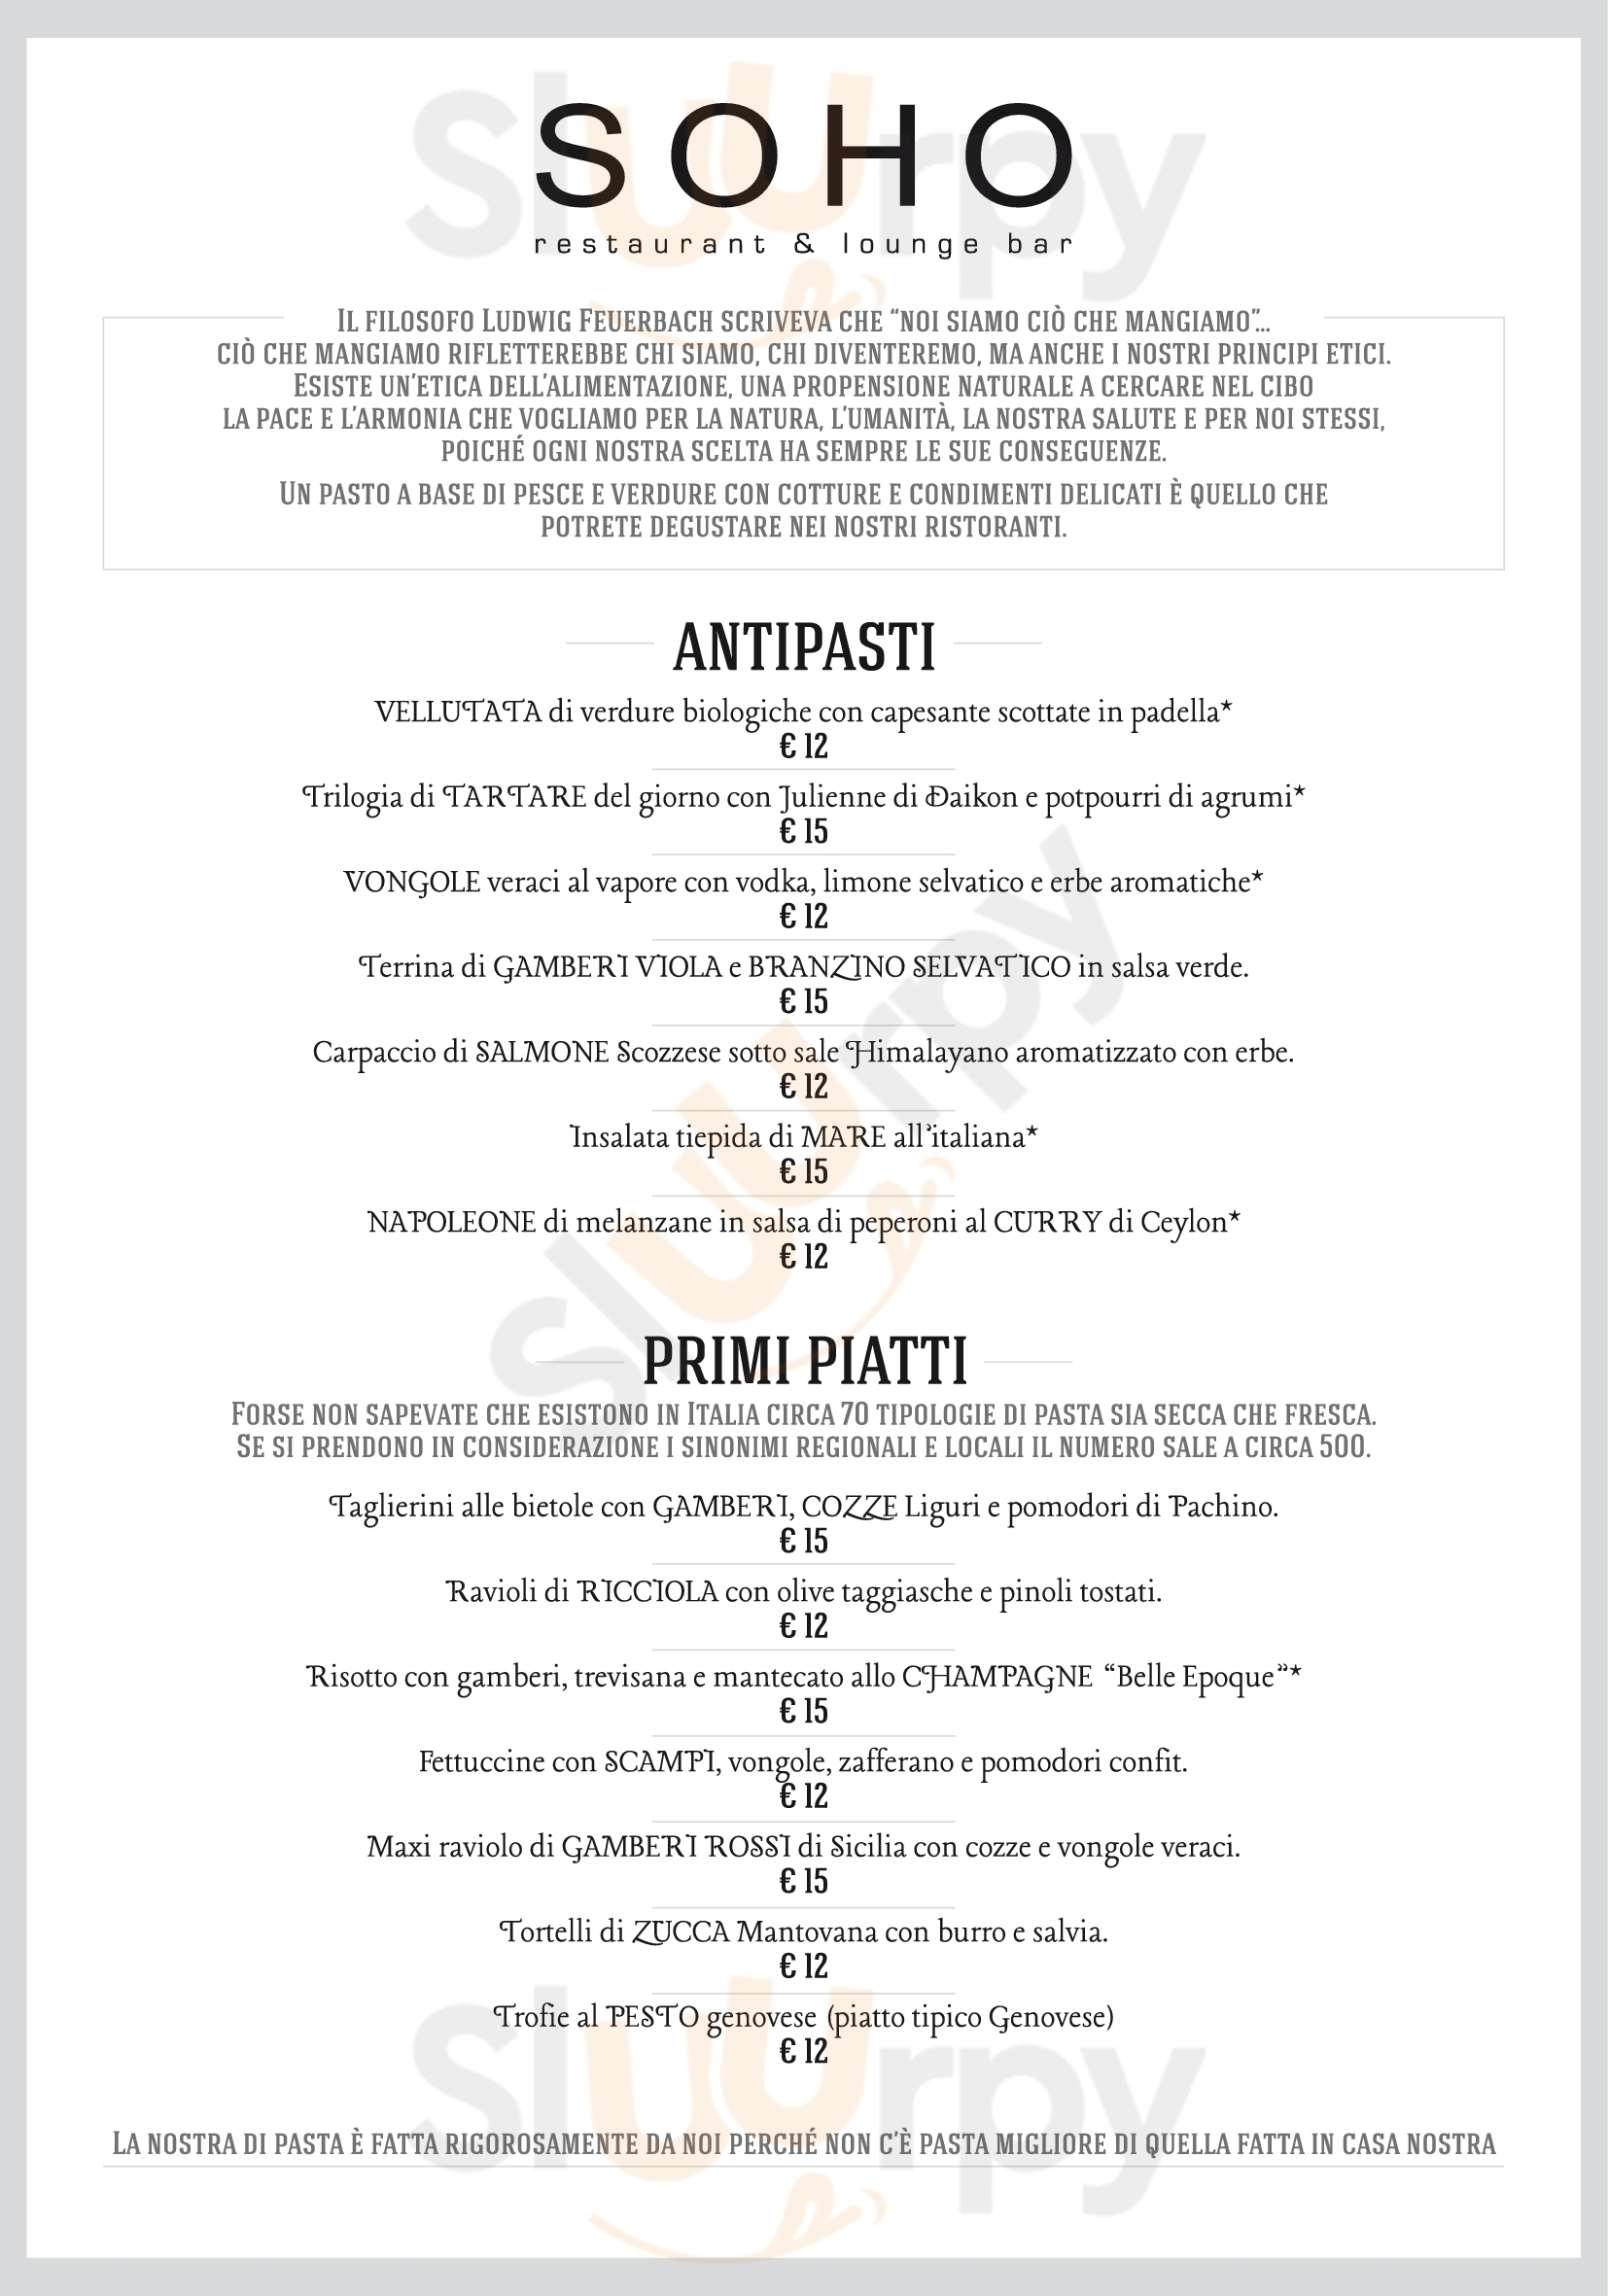 Soho Restaurant Genova menù 1 pagina